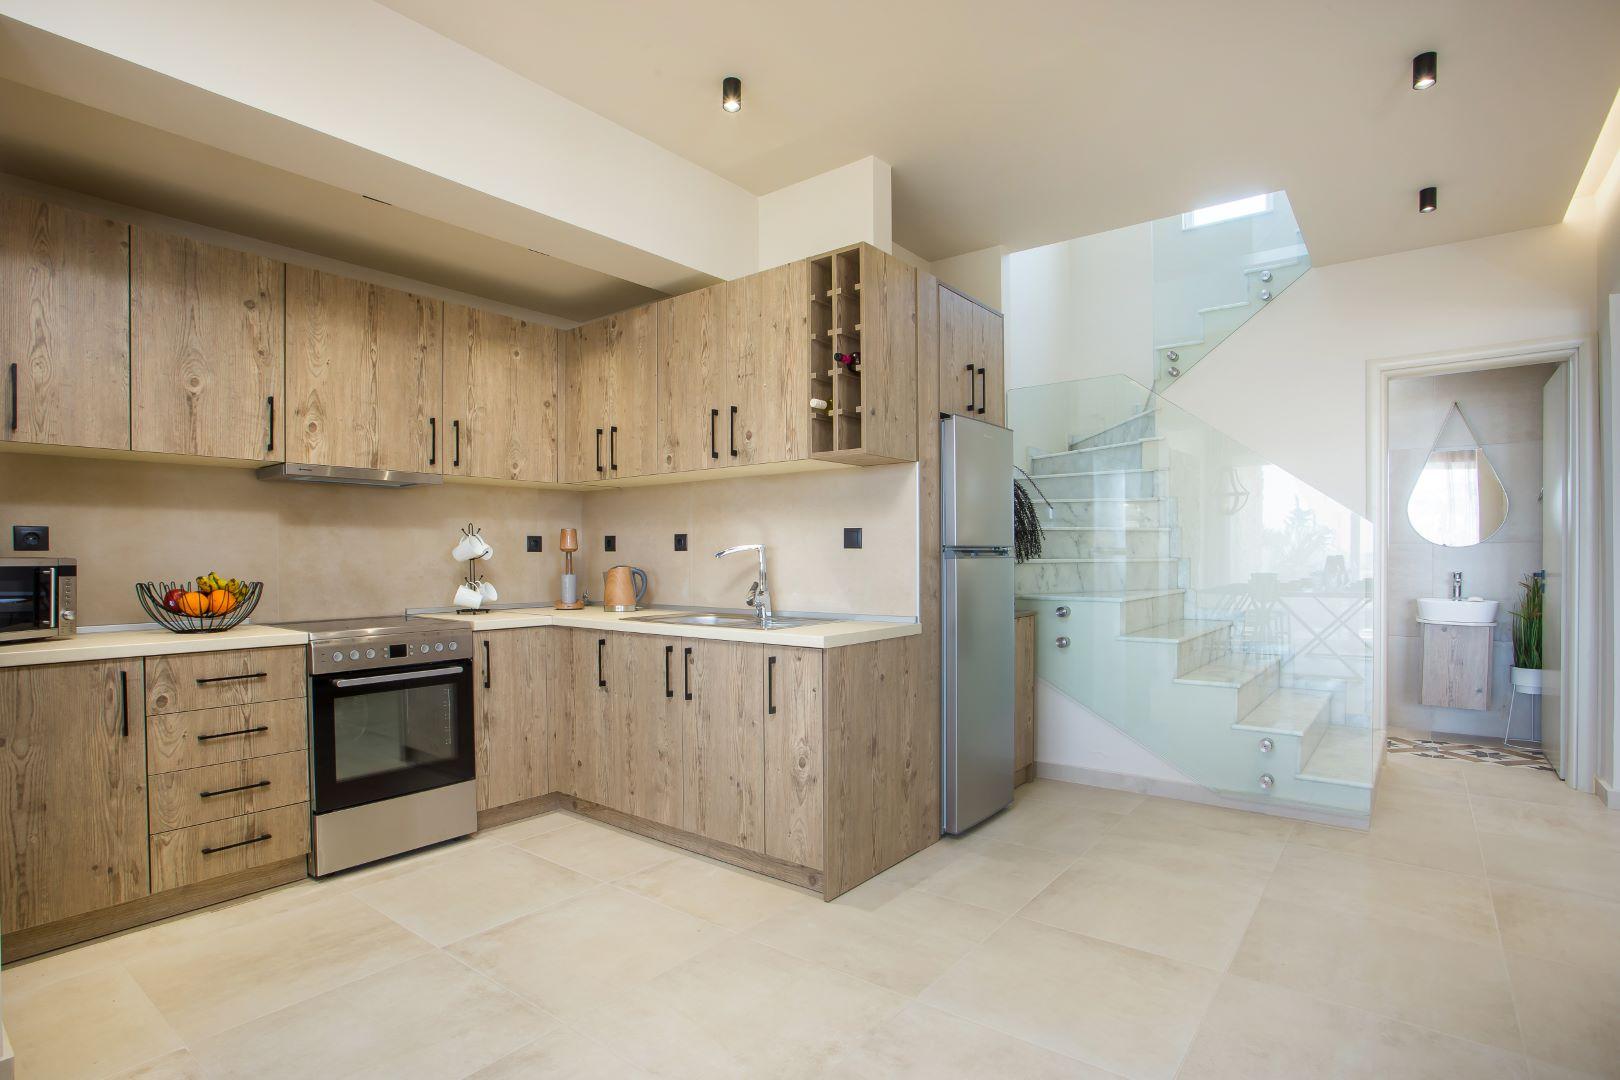 Venezia-Luxury-Living-villas-at-Faliraki-Rhodes-Greece-1